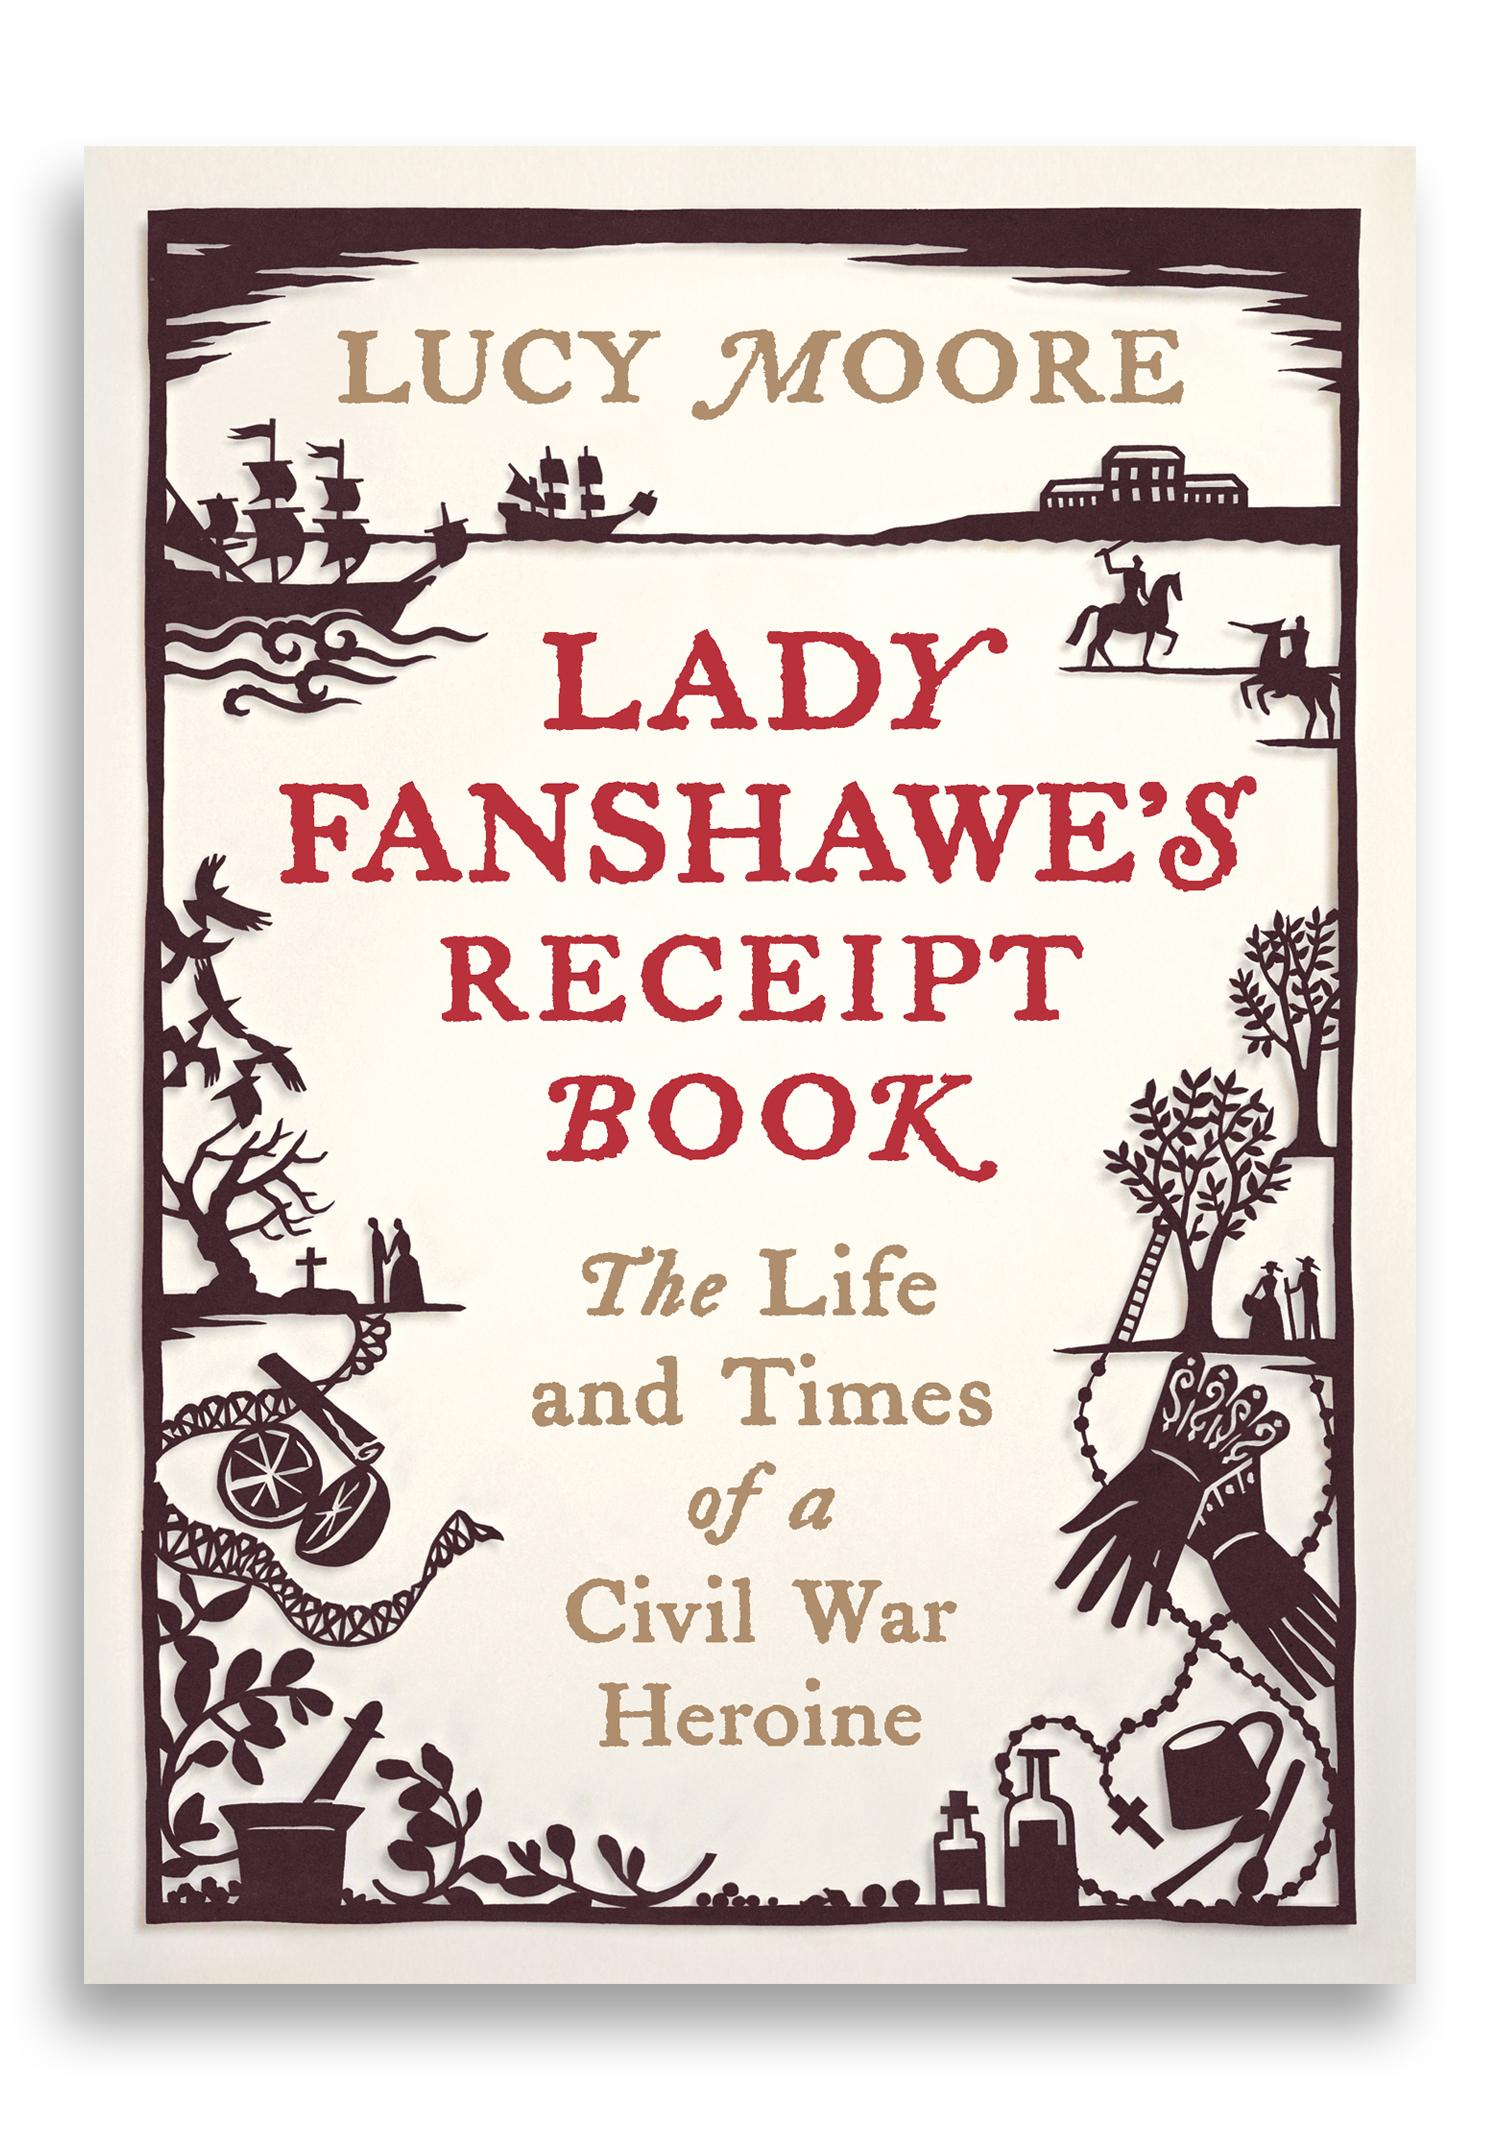 Lady Fanshawe's Receipt Book.jpg